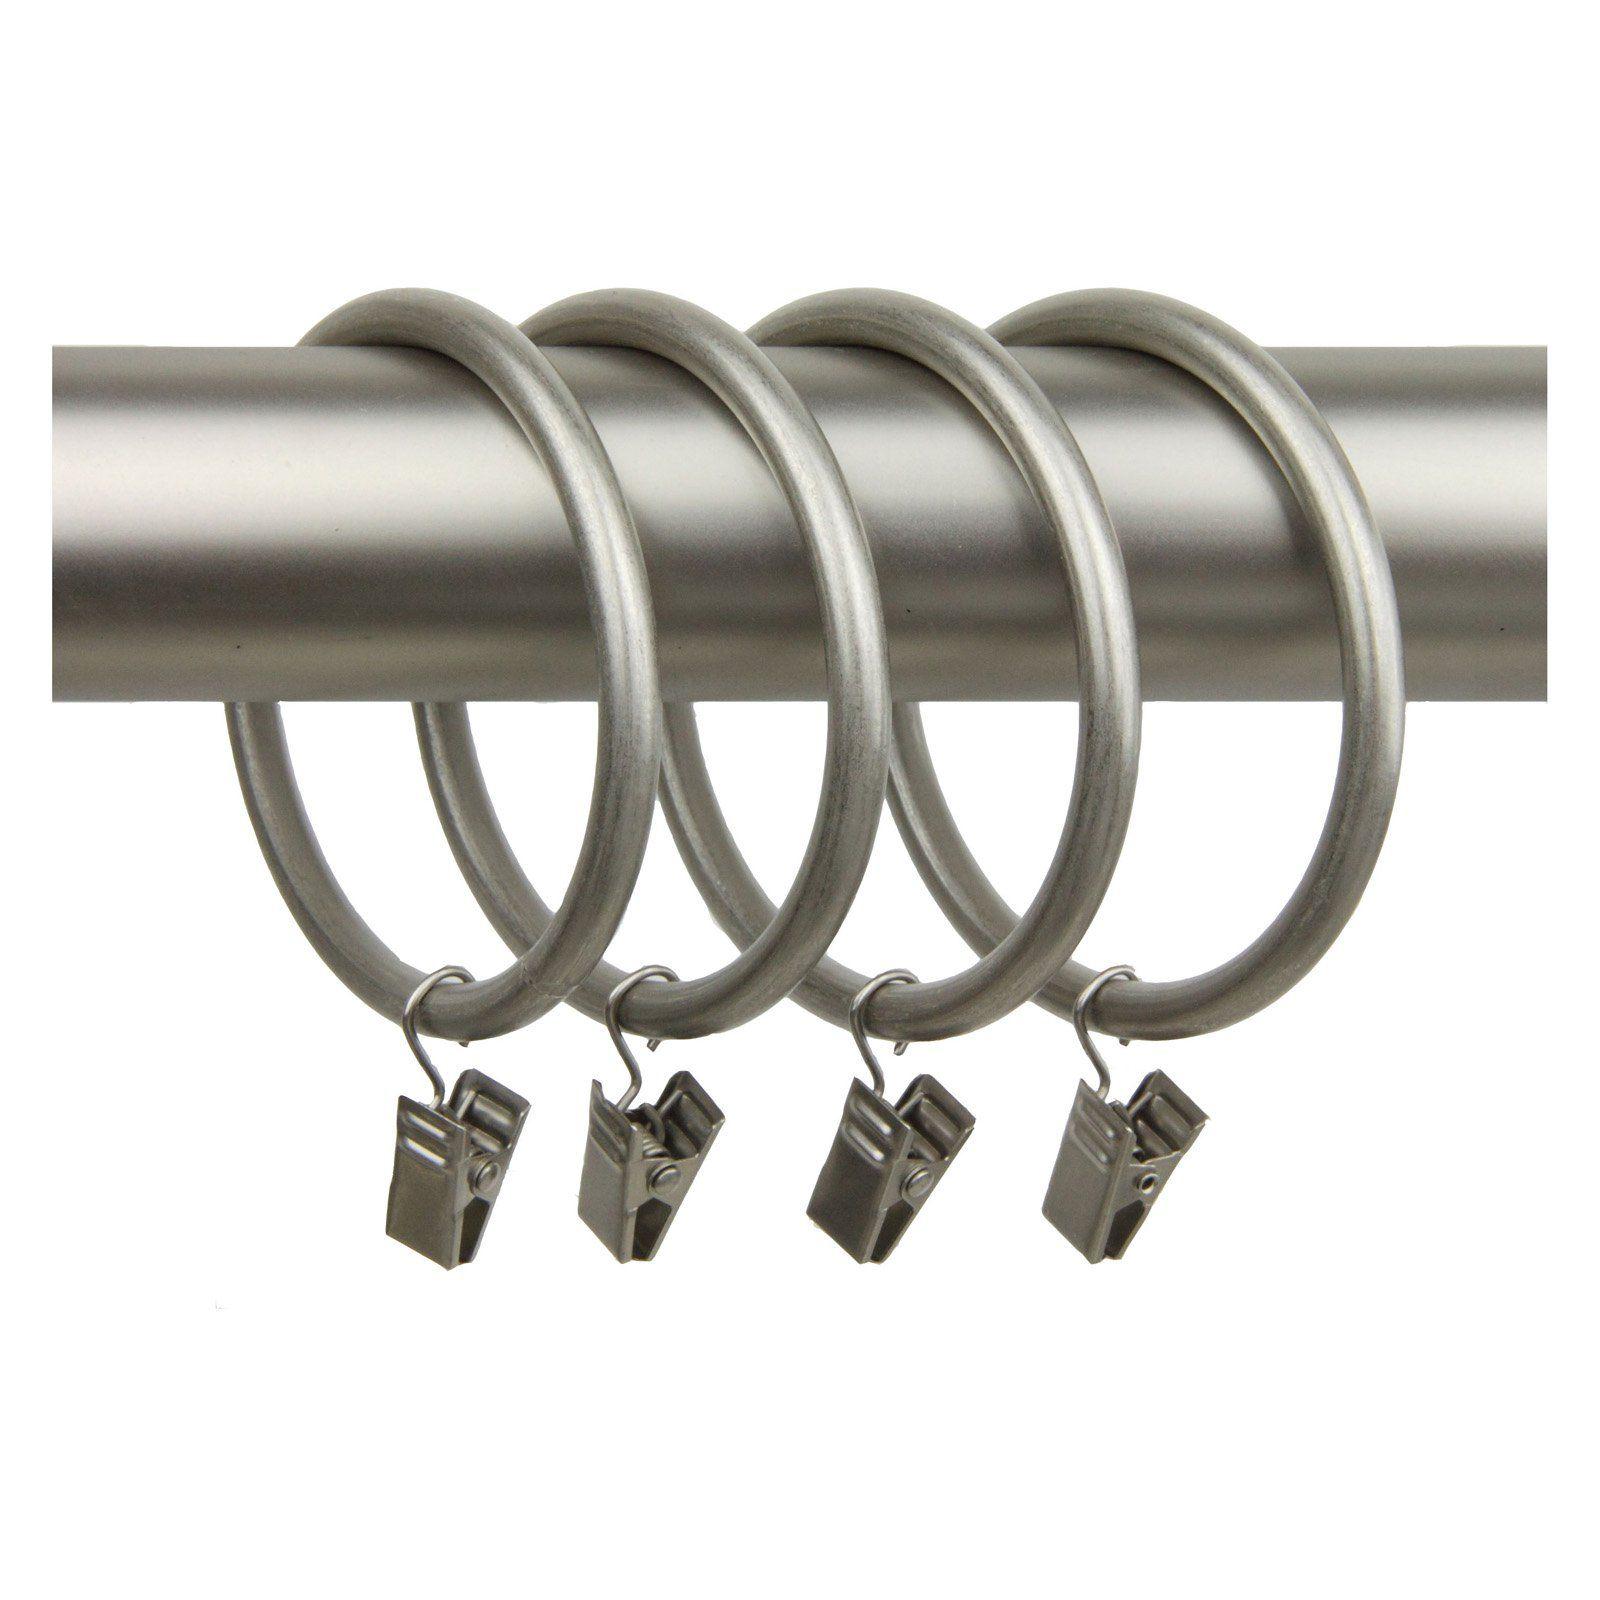 Rod Desyne 10 Curtain Clip Rings 2 5 In Inside Diameter Curtain